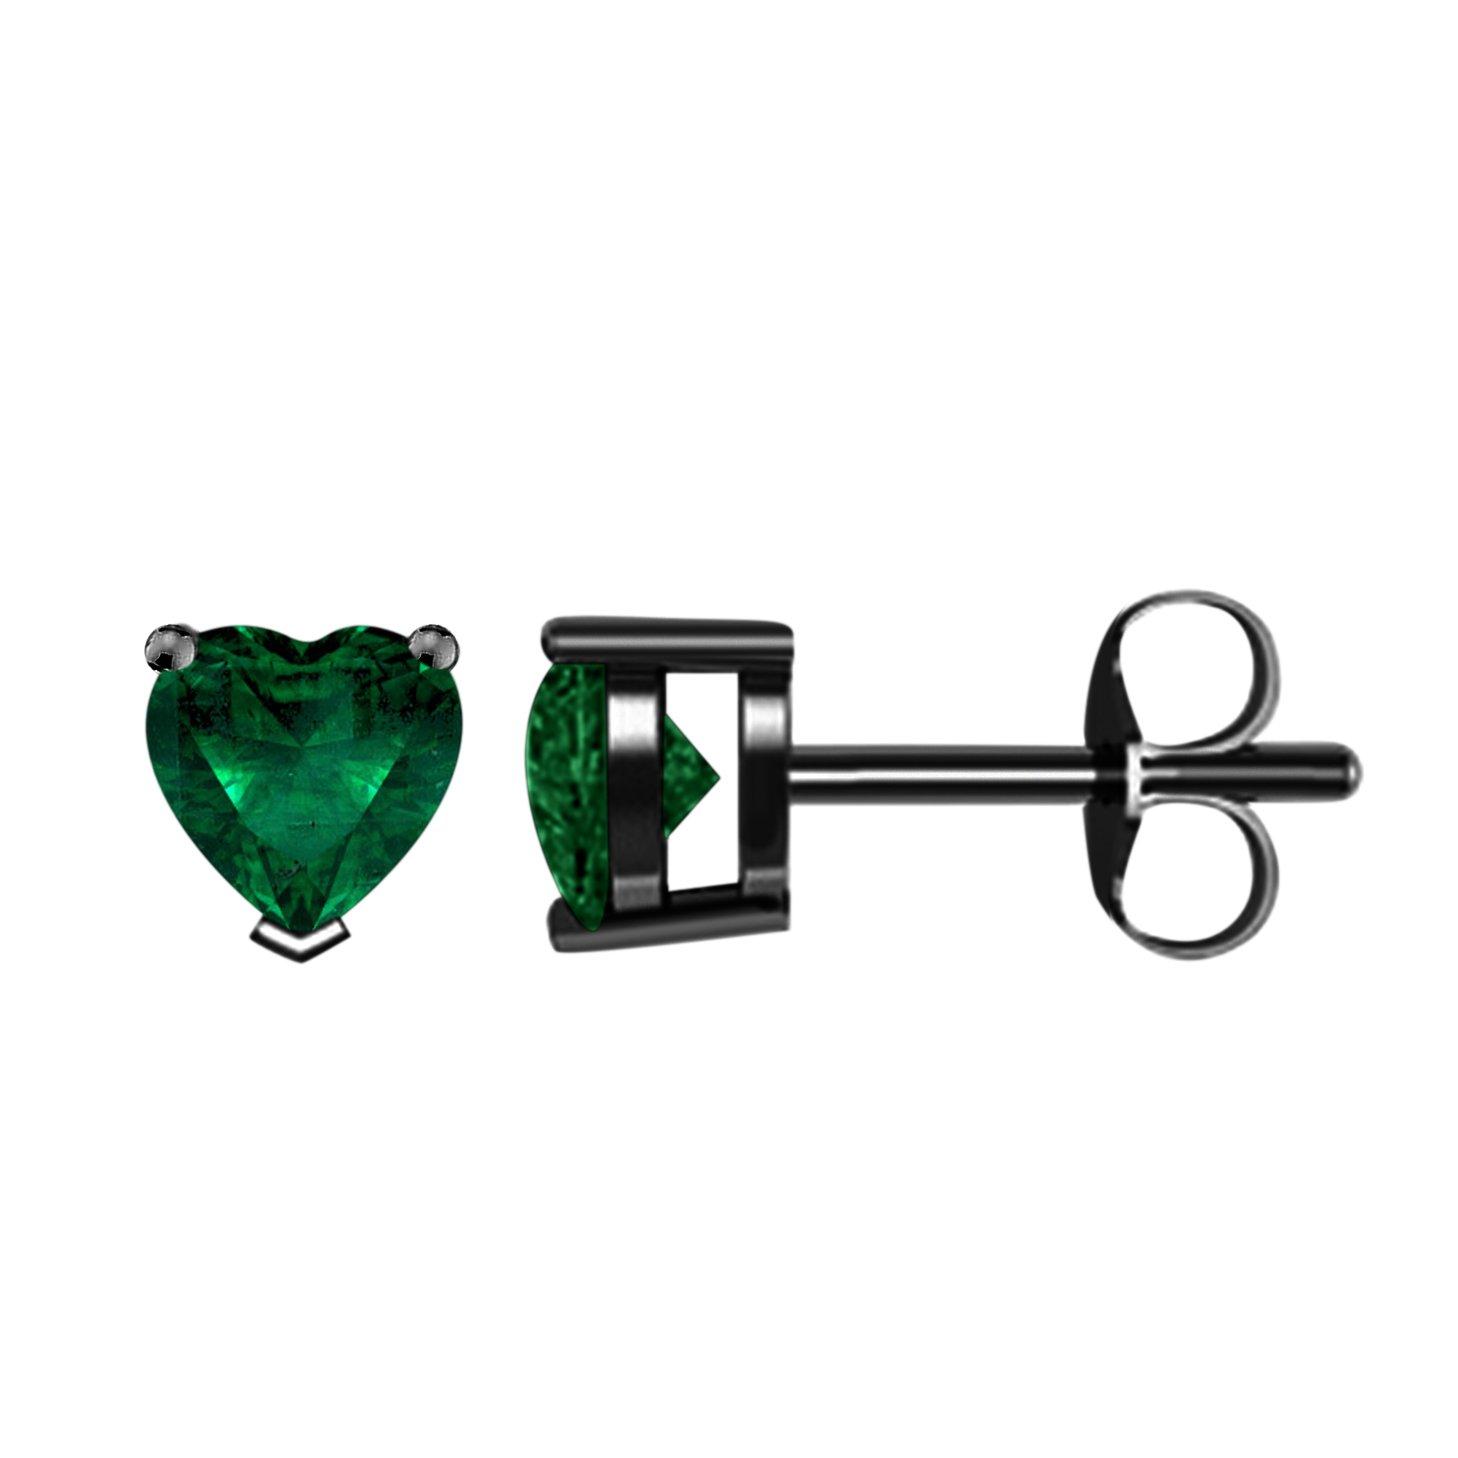 14K Black Rhodium Plated CZ Stud Earrings Clear Emerald CZ Stud Ear Stud 4mm To 8mm